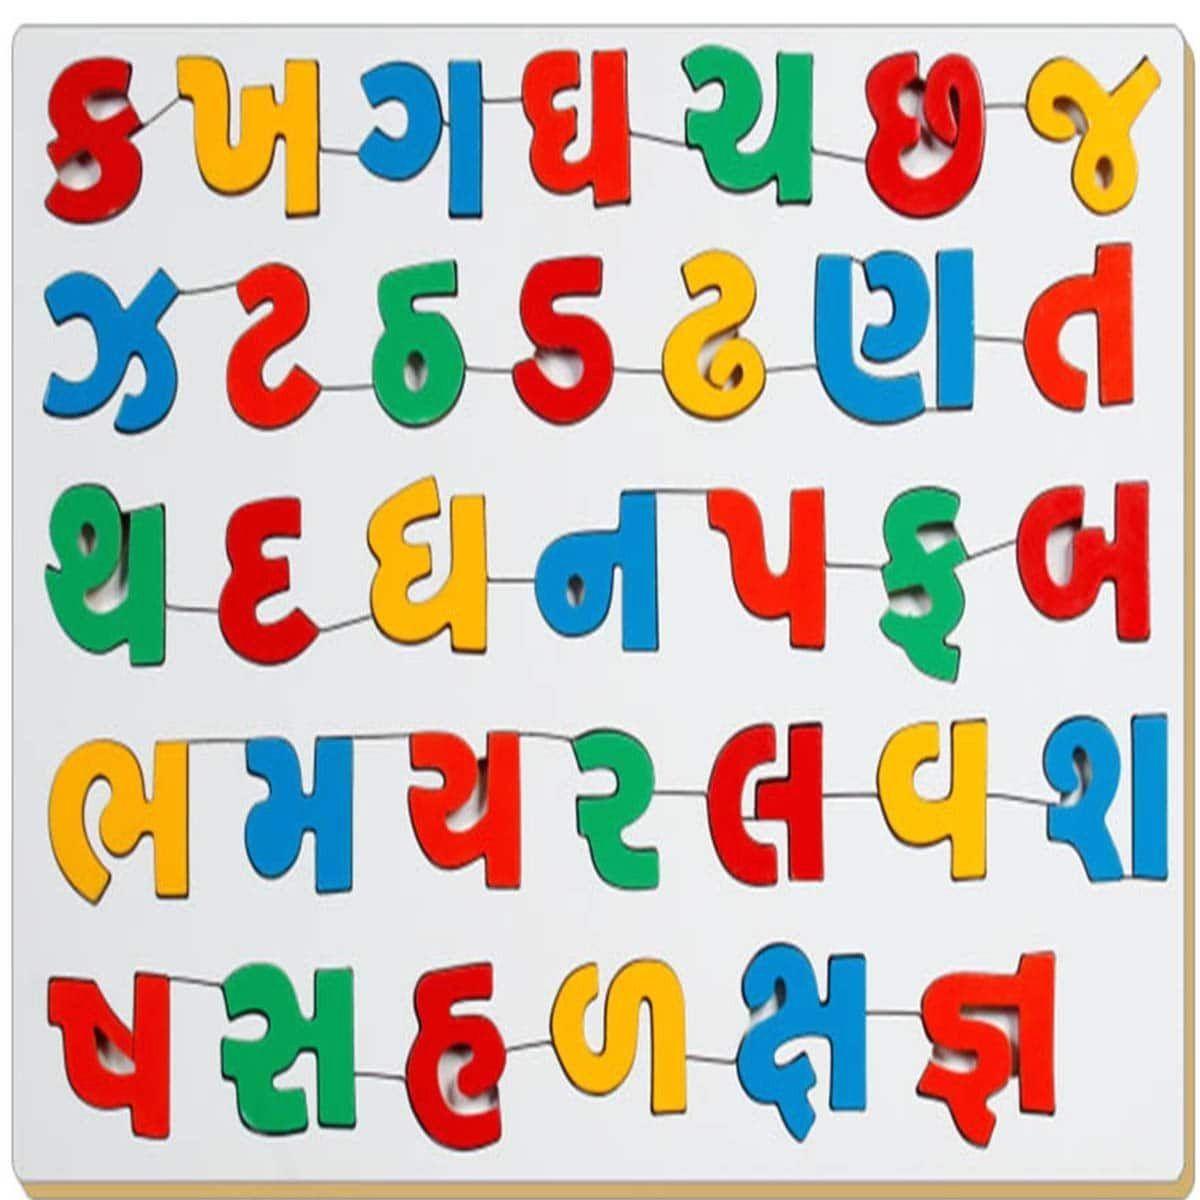 Gujarati Alphabet Worksheet Worksheetfun 1000 Alphabet Worksheets Alphabet Practice Worksheets Printable Alphabet Worksheets [ 1200 x 1200 Pixel ]